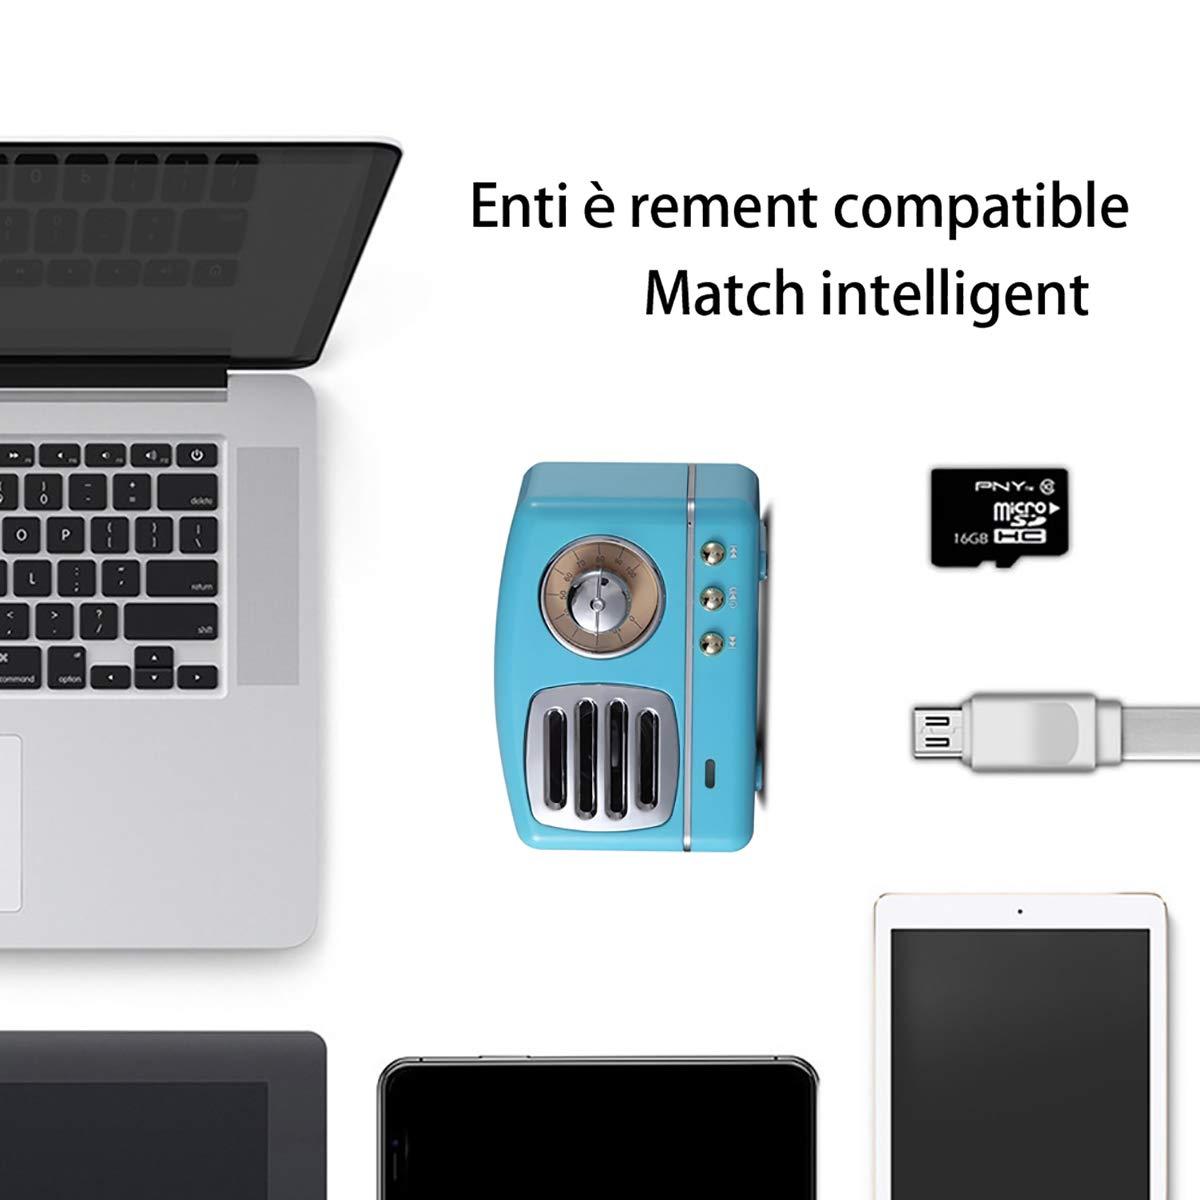 Mini altavoz inalámbrico, HM11 Retro con Bluetooth altavoz estéreo con salida 3 W, lectura super larga duración, carga USB - Funciona con iPhone, iPad, ...